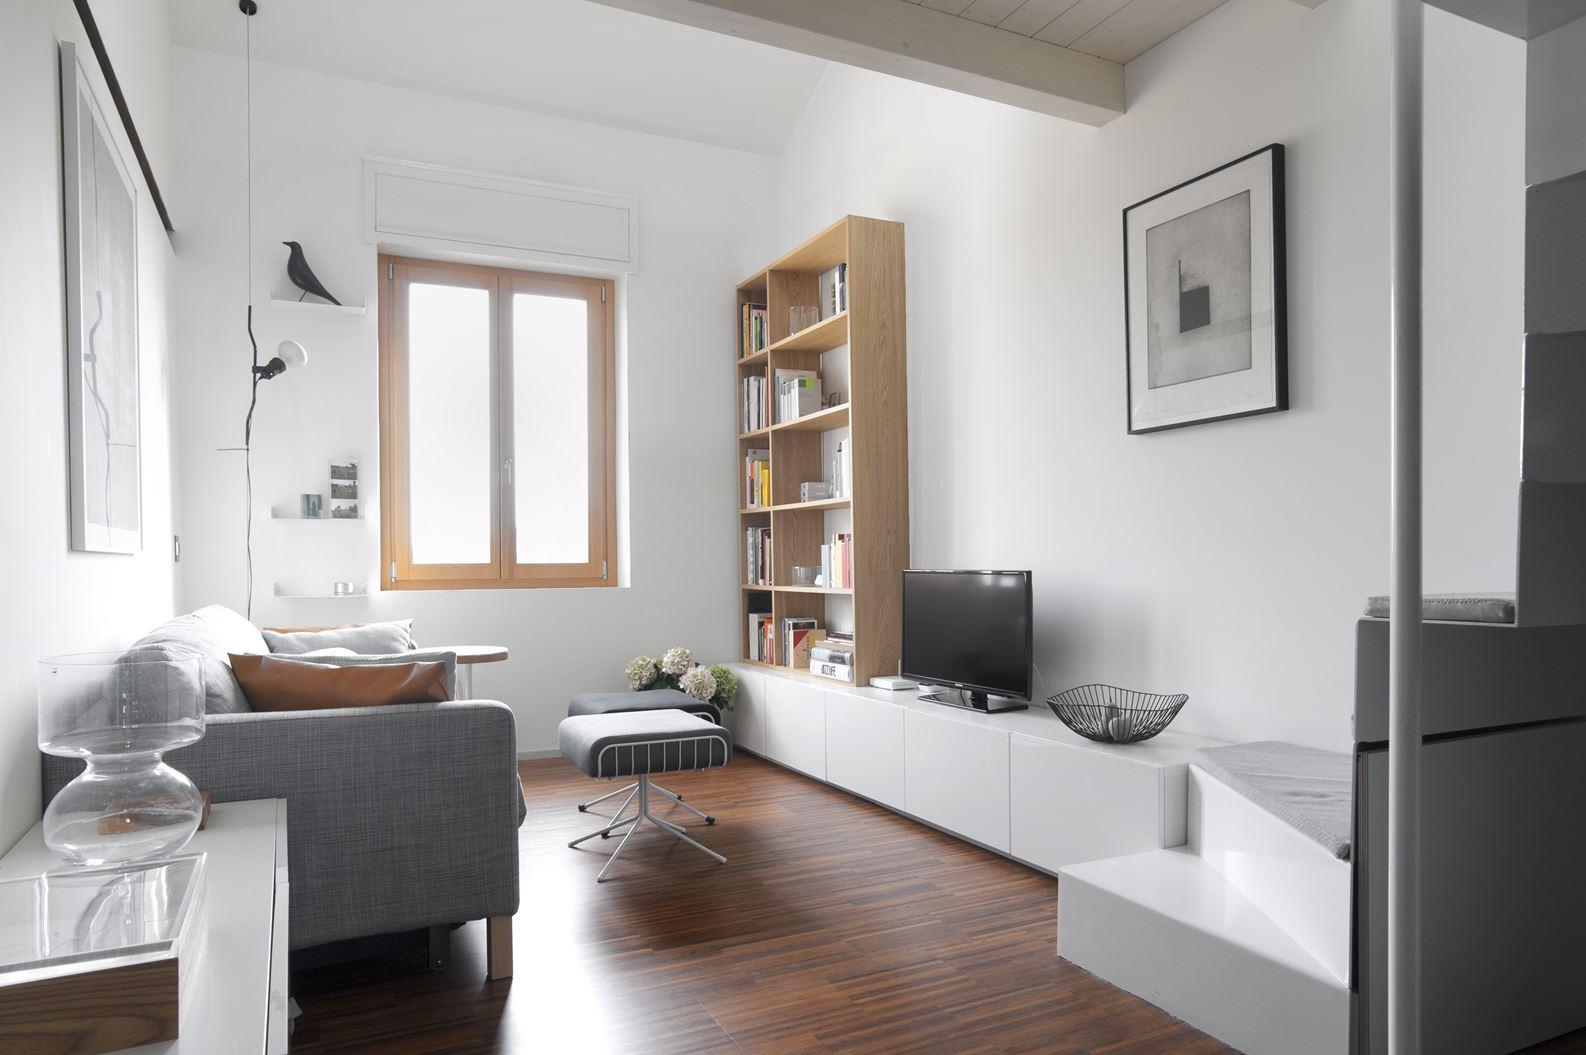 Un appartamento con studio in mansarda - Cucina con soppalco ...